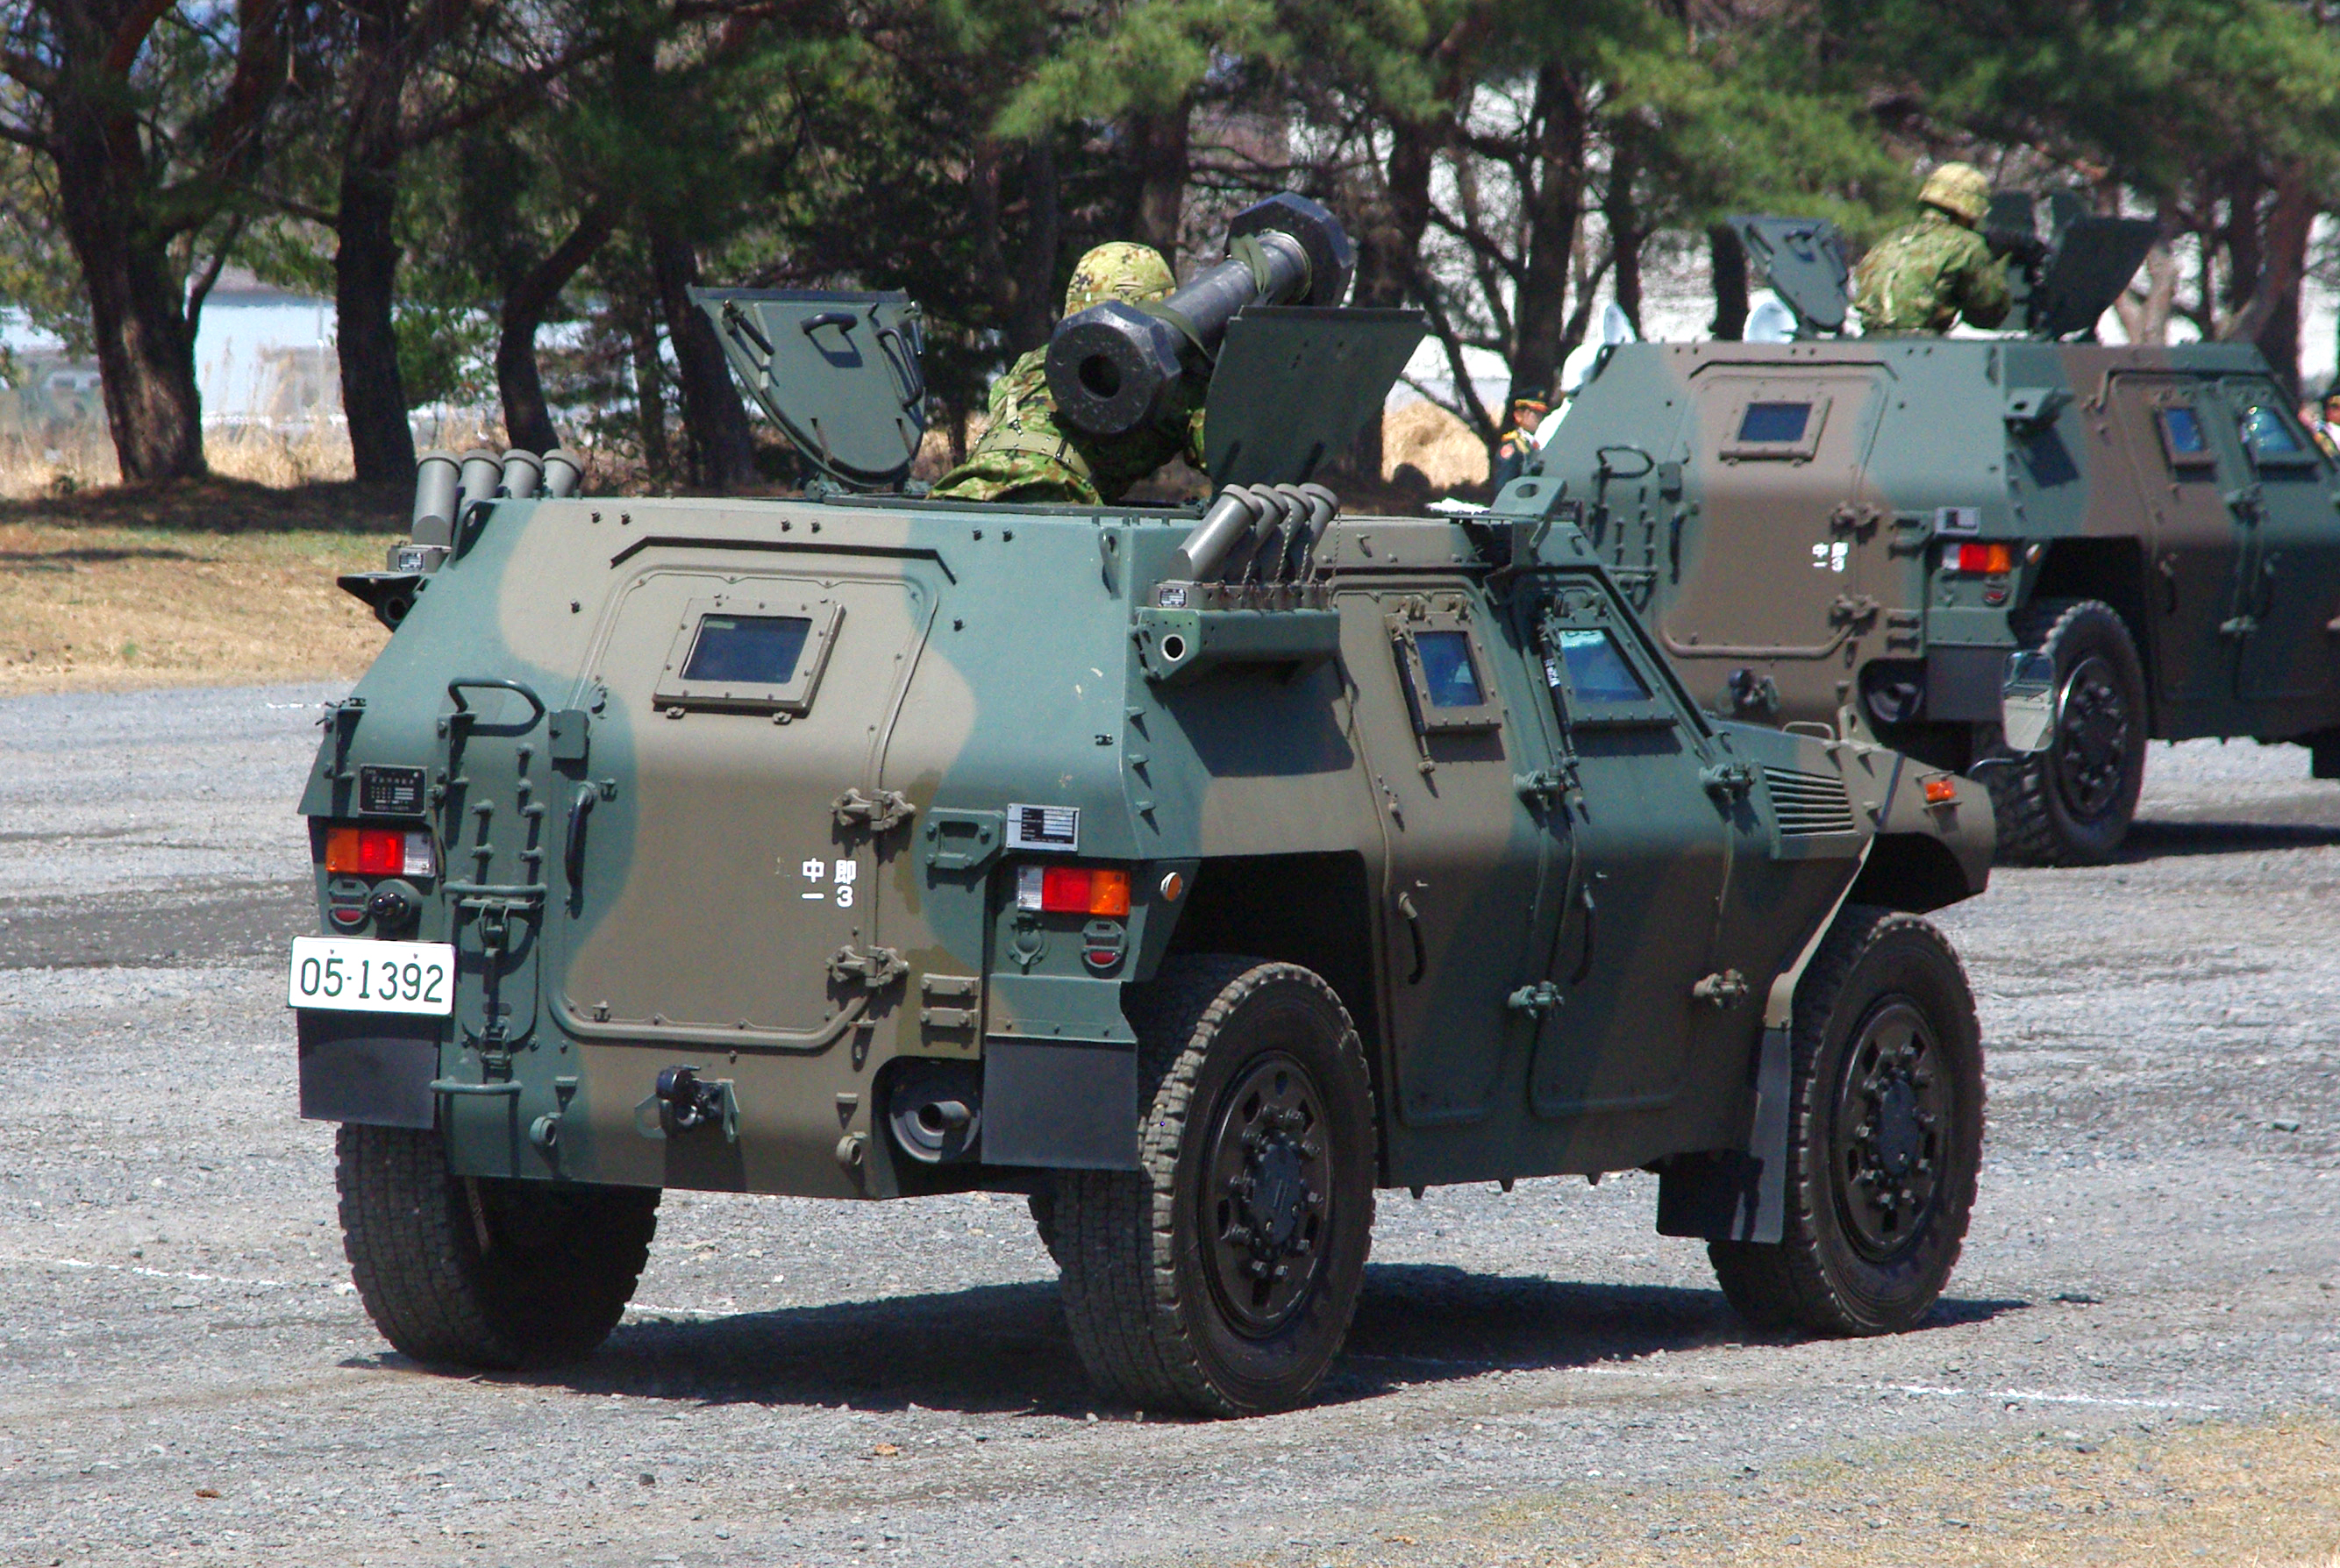 File:JGSDF Light Armored Vehicle 20120408 02.JPG Awesome Ideas